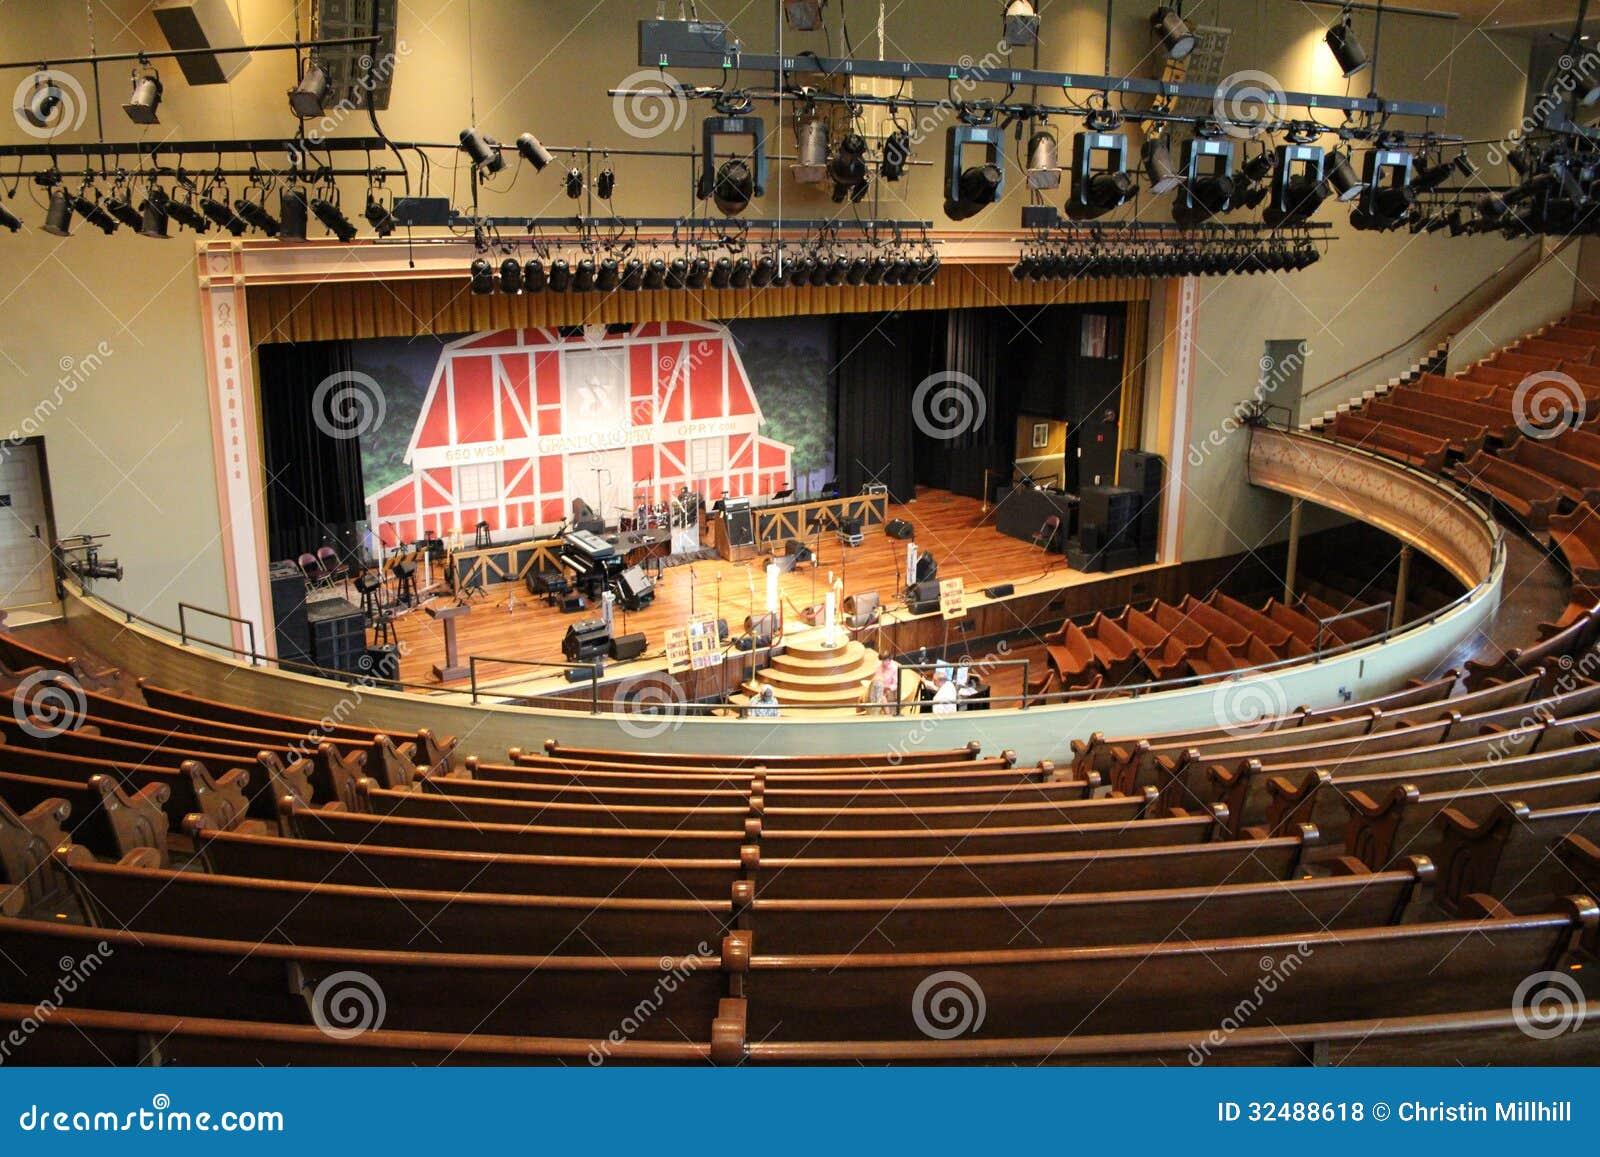 Ryman Seating Chart Opry - Ryman auditorium seating grand ole opry ...